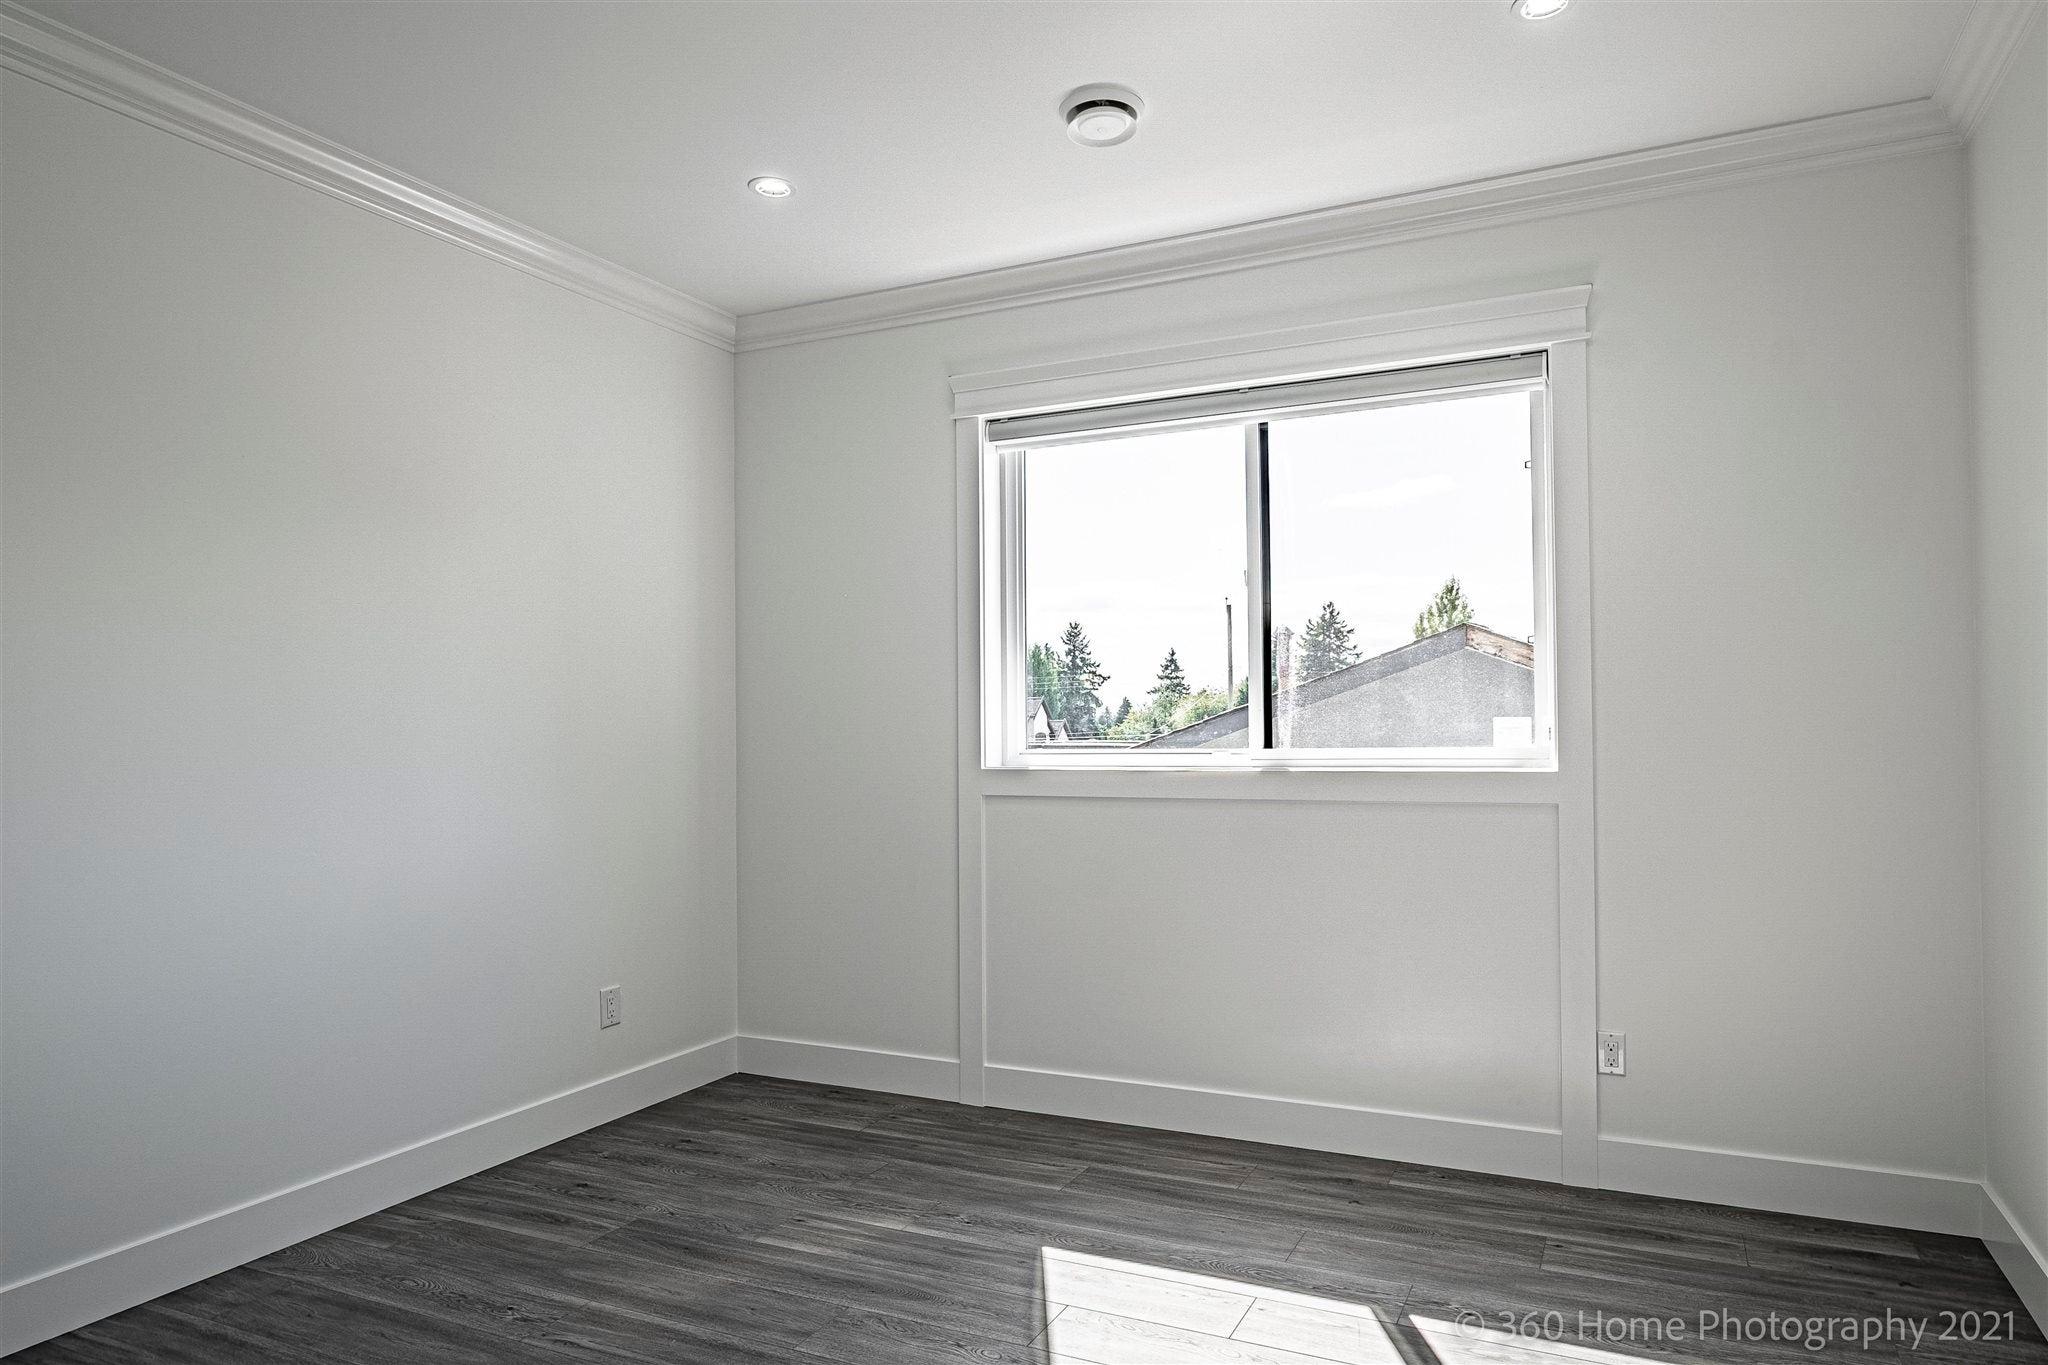 13050 101B AVENUE - Cedar Hills House/Single Family for sale, 5 Bedrooms (R2602208) - #18